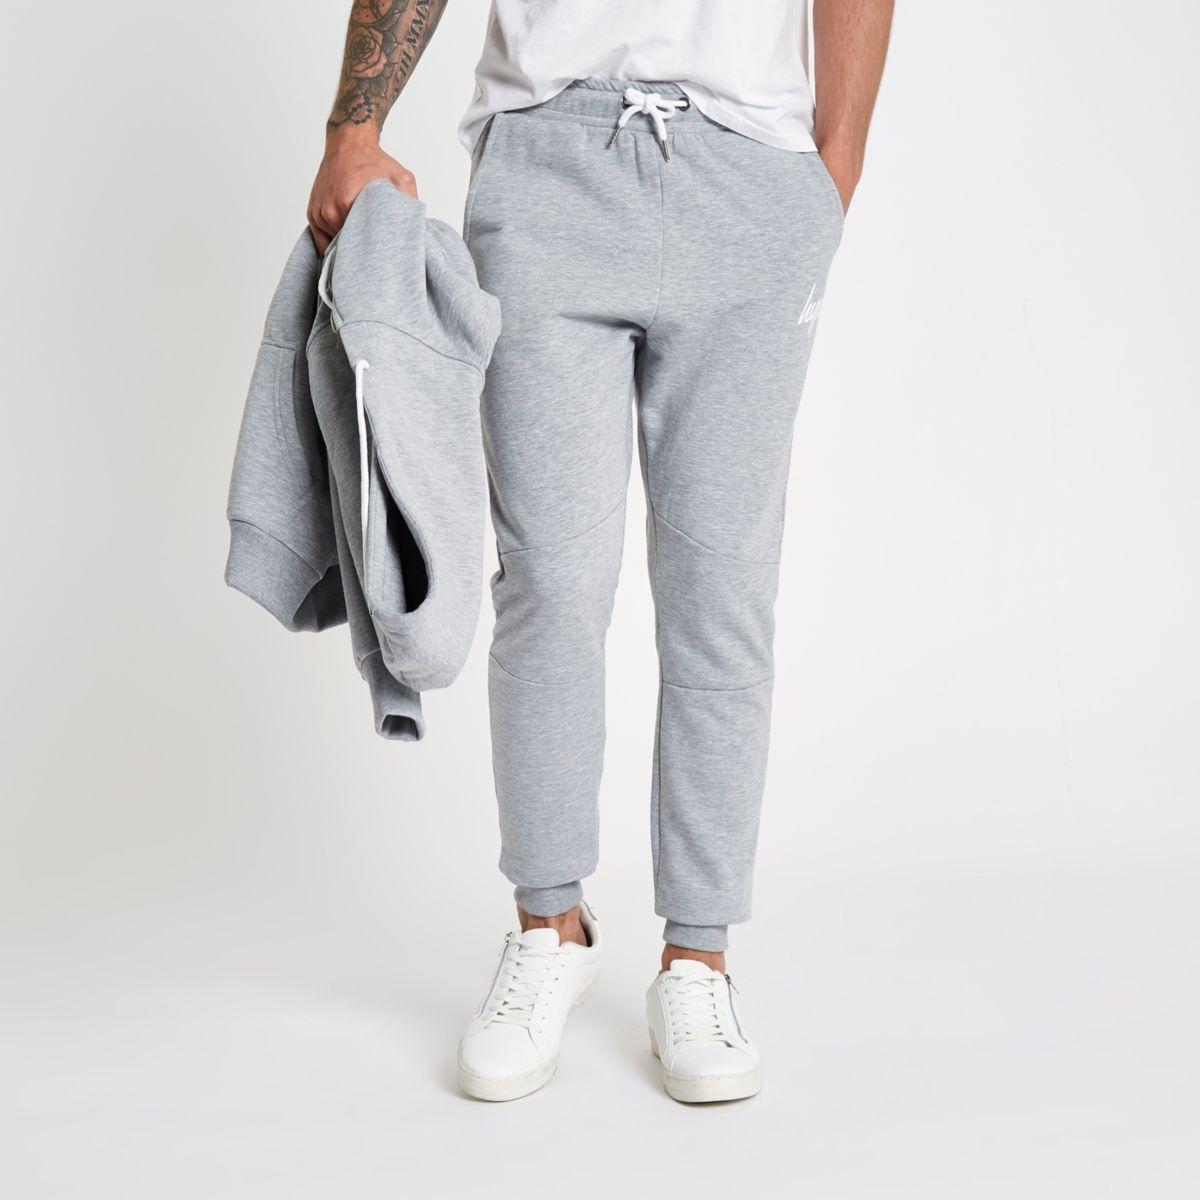 Grey Hype joggers